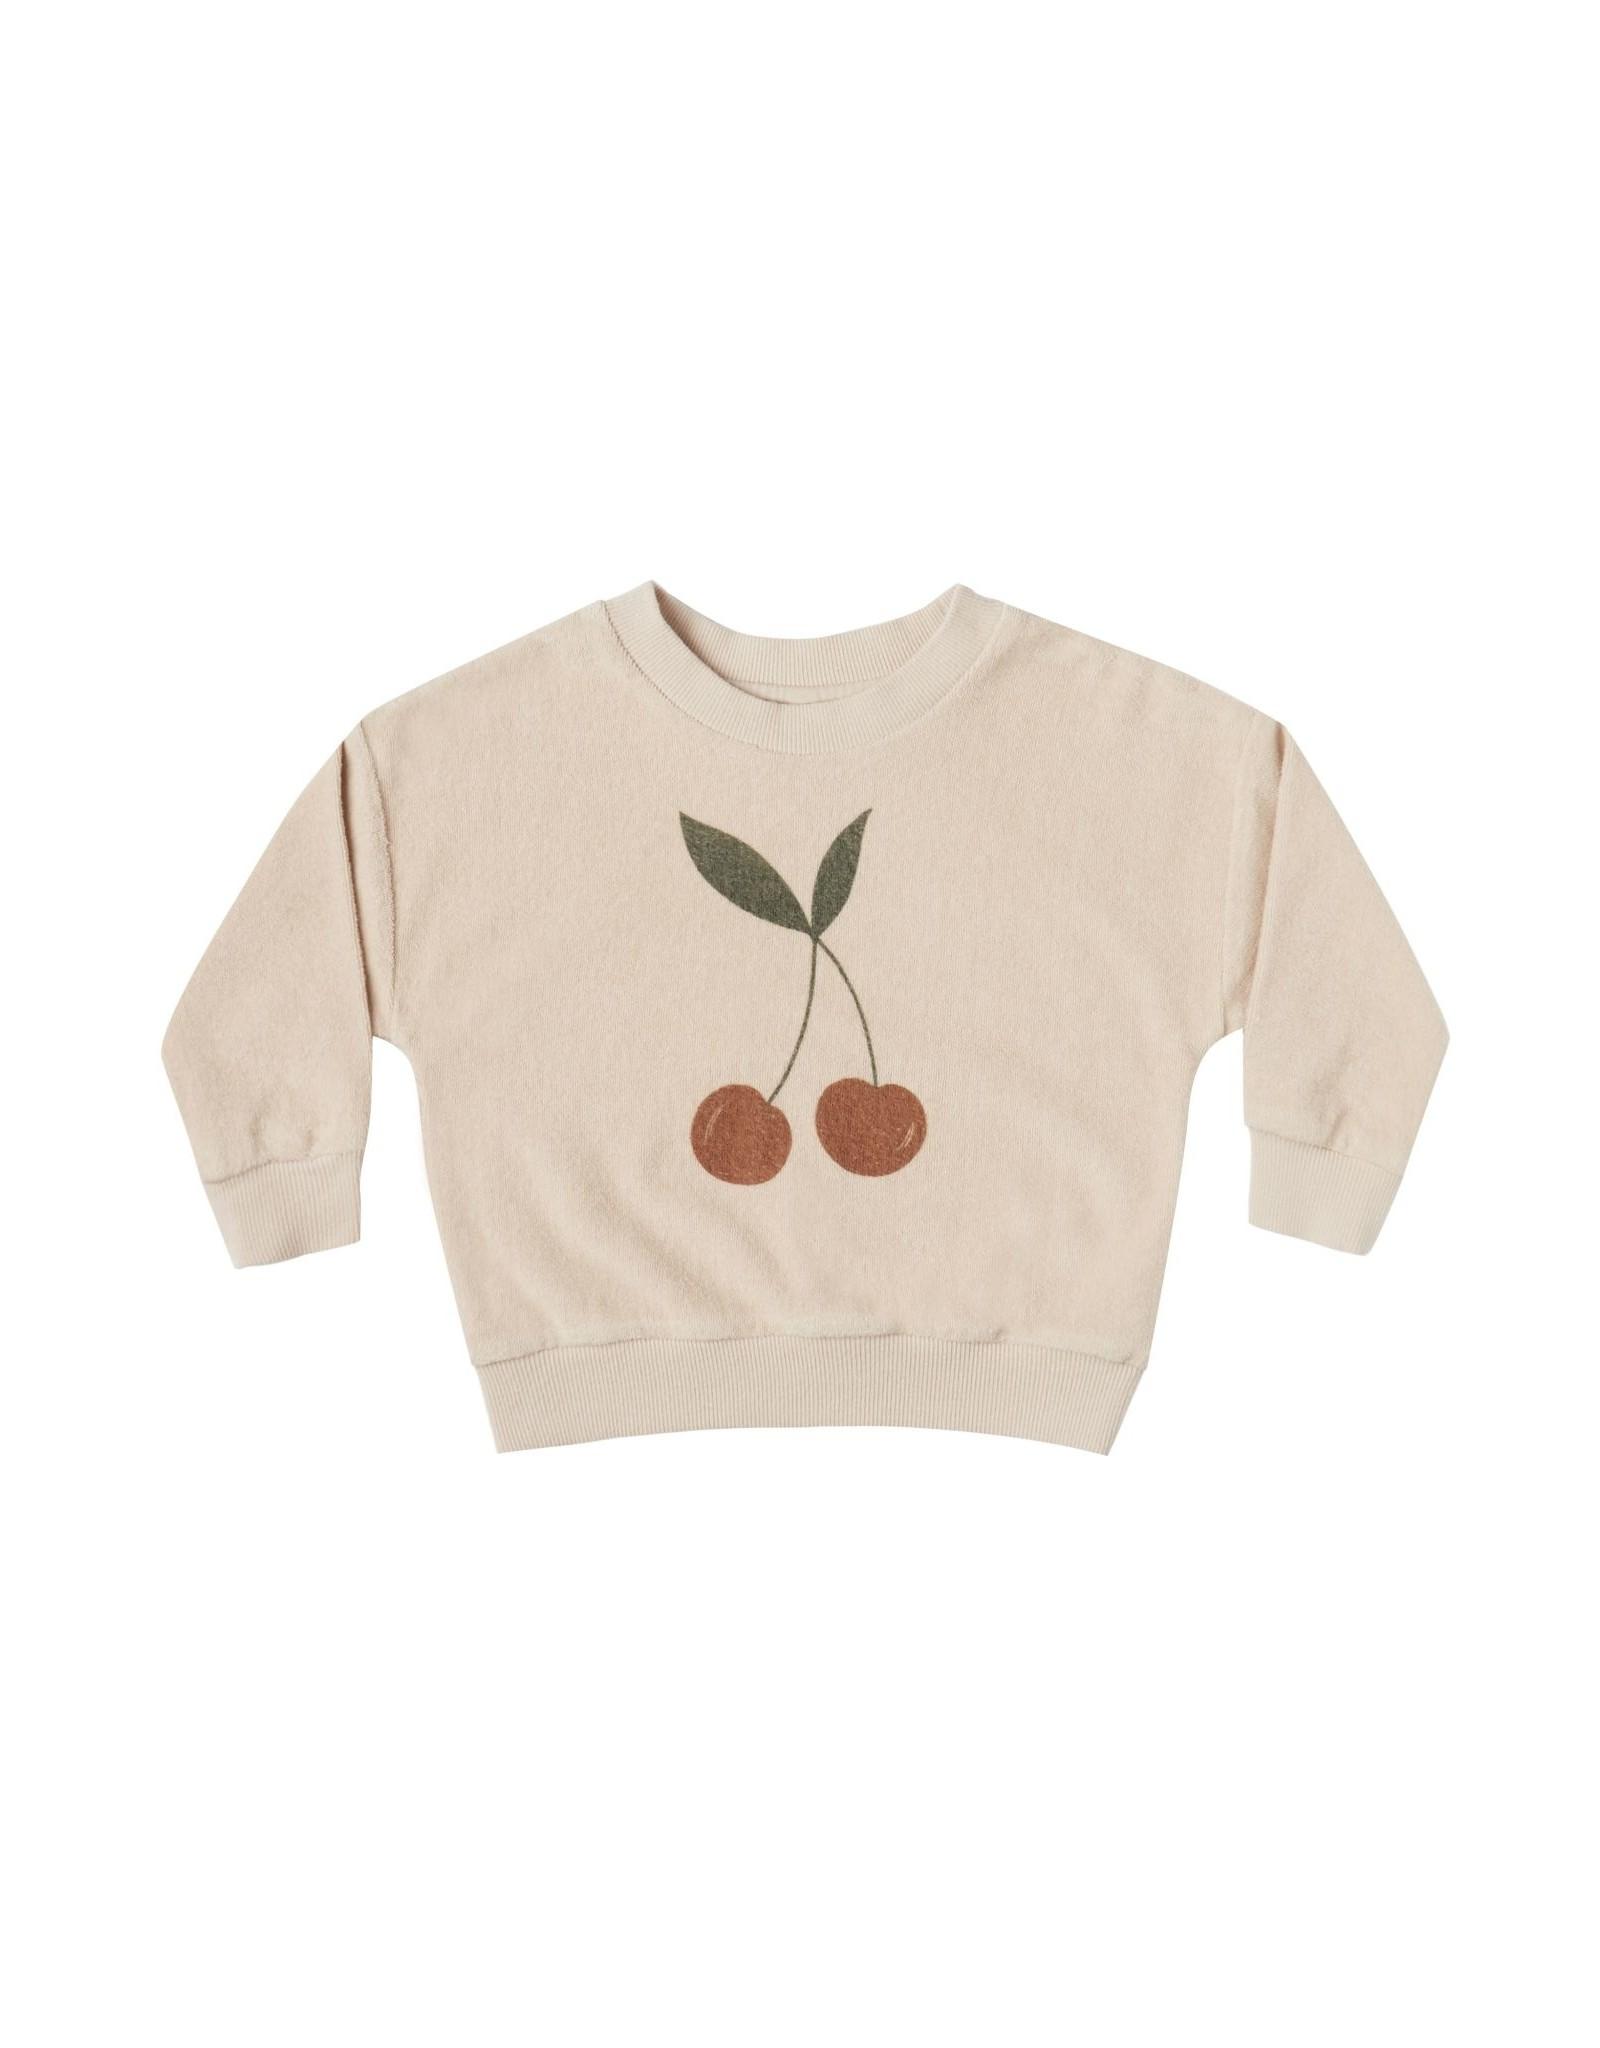 Rylee & Cru Rylee & Cru Fleece Sweatshirt